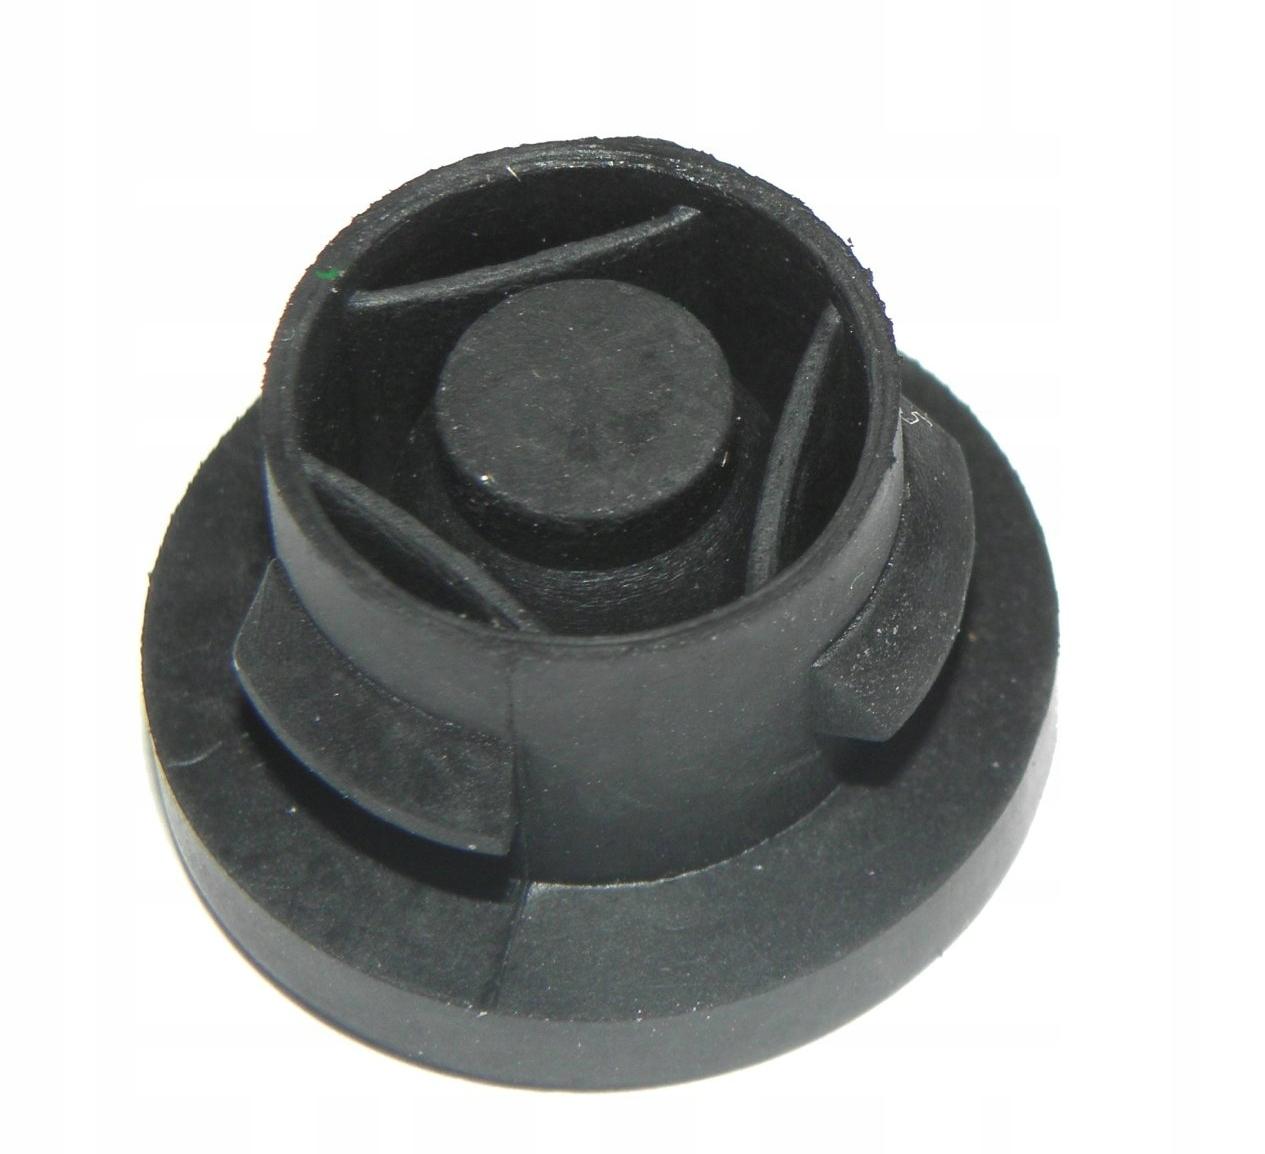 резина gumkatext=болт корпуса фильтра воздуха собаки 16 hditext=автомат